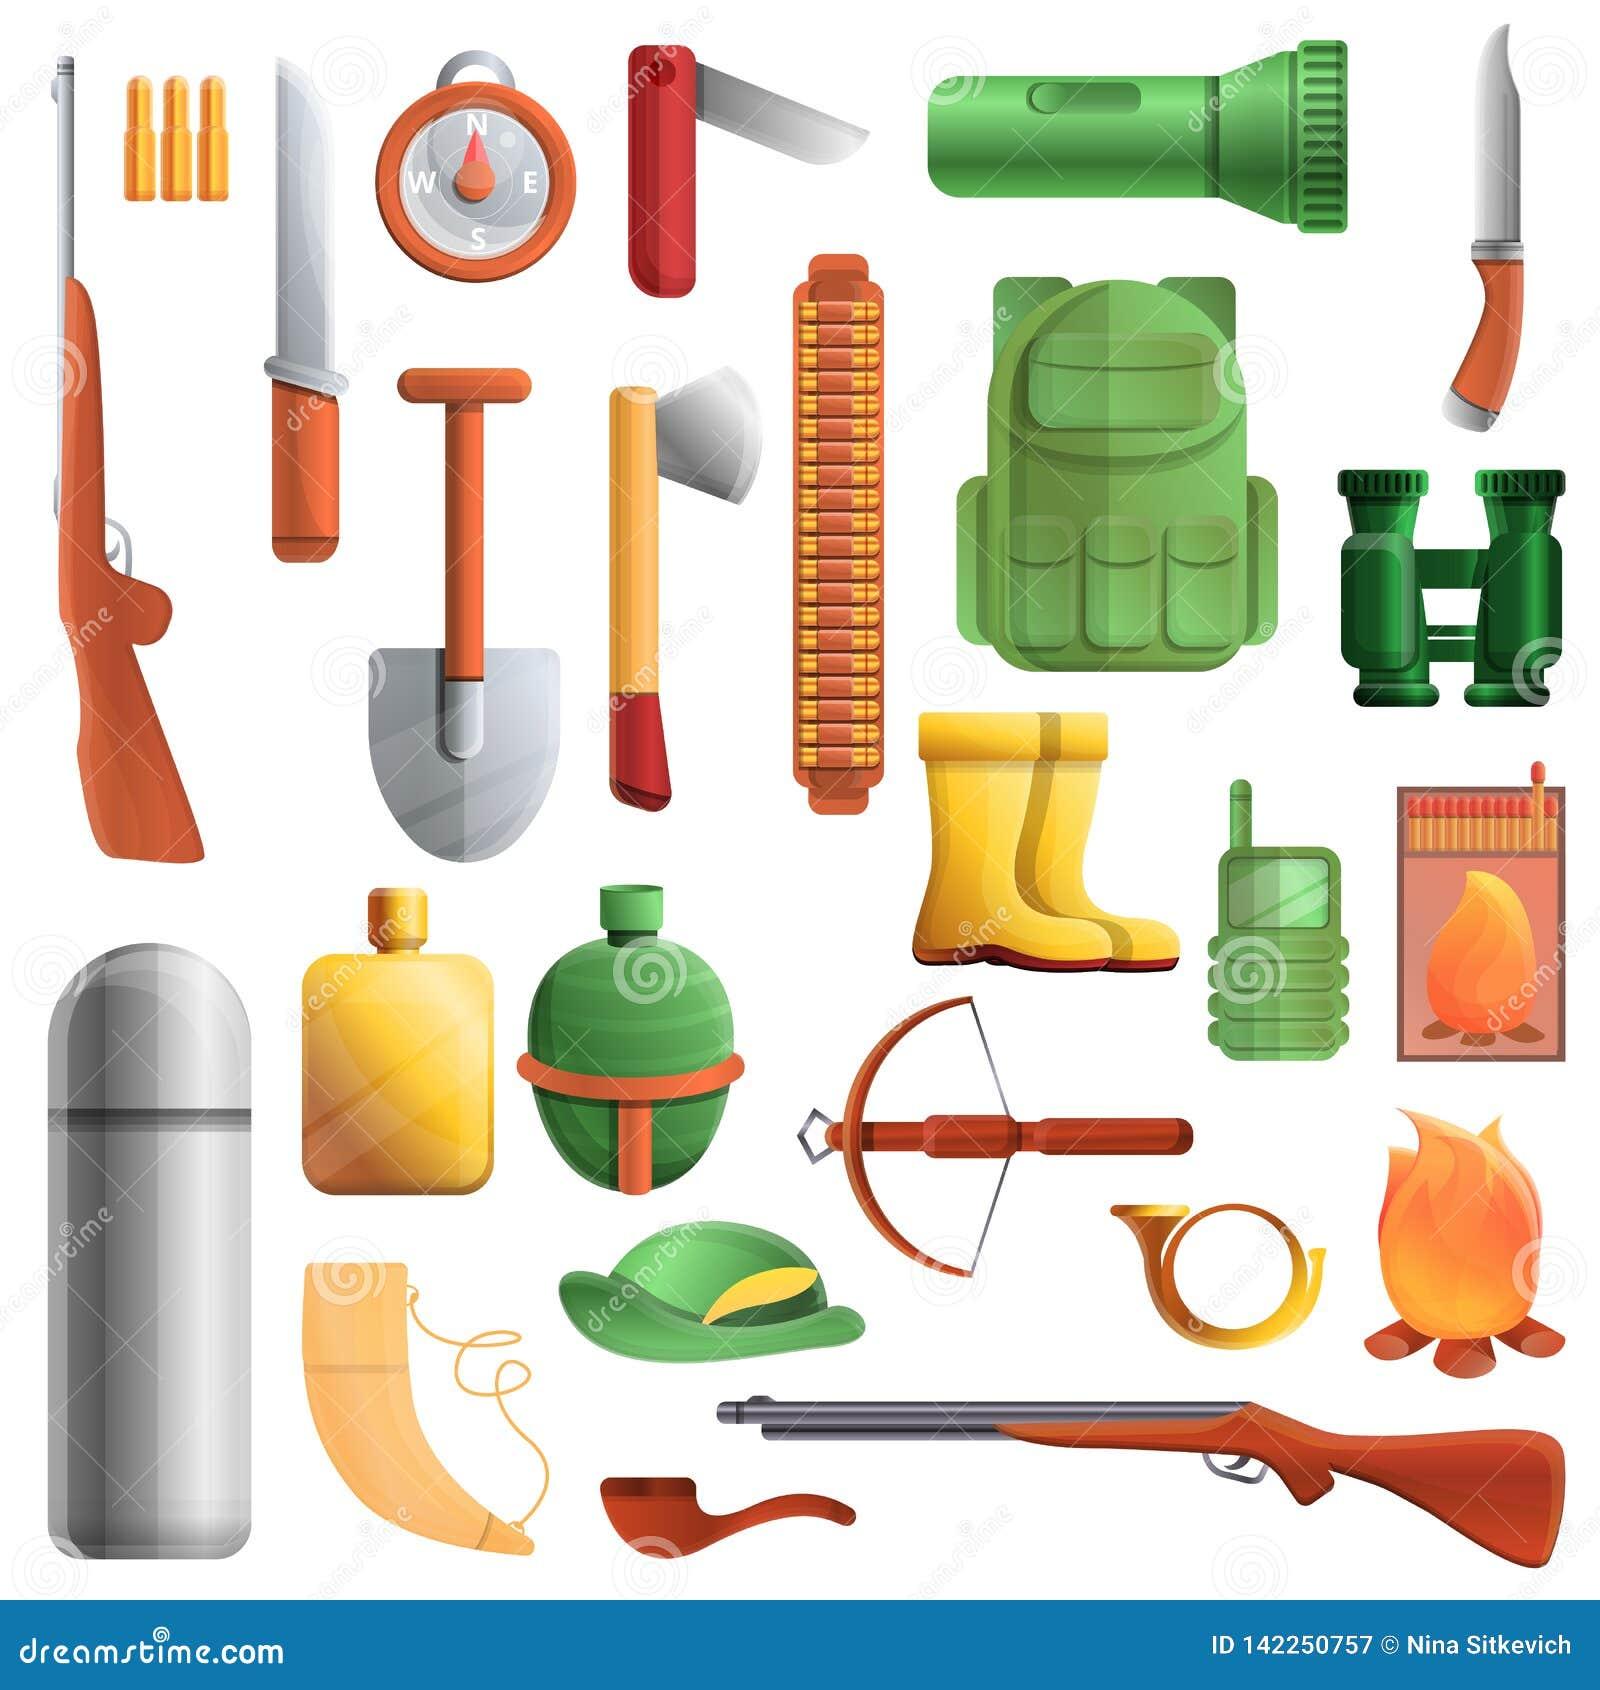 Hunting equipment icons set, cartoon style